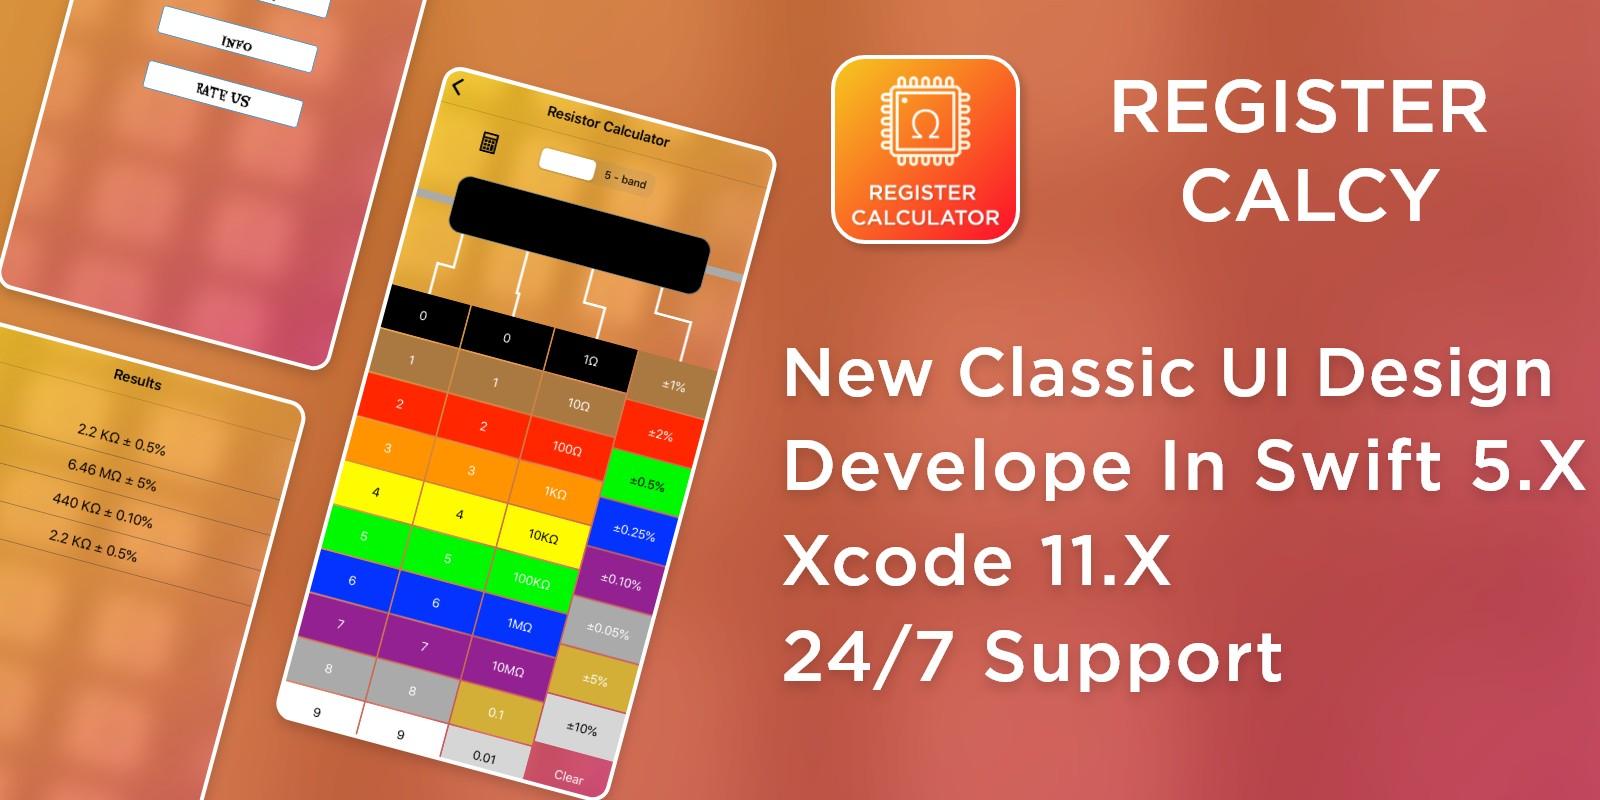 Resistor Calculator - iOS Source Code